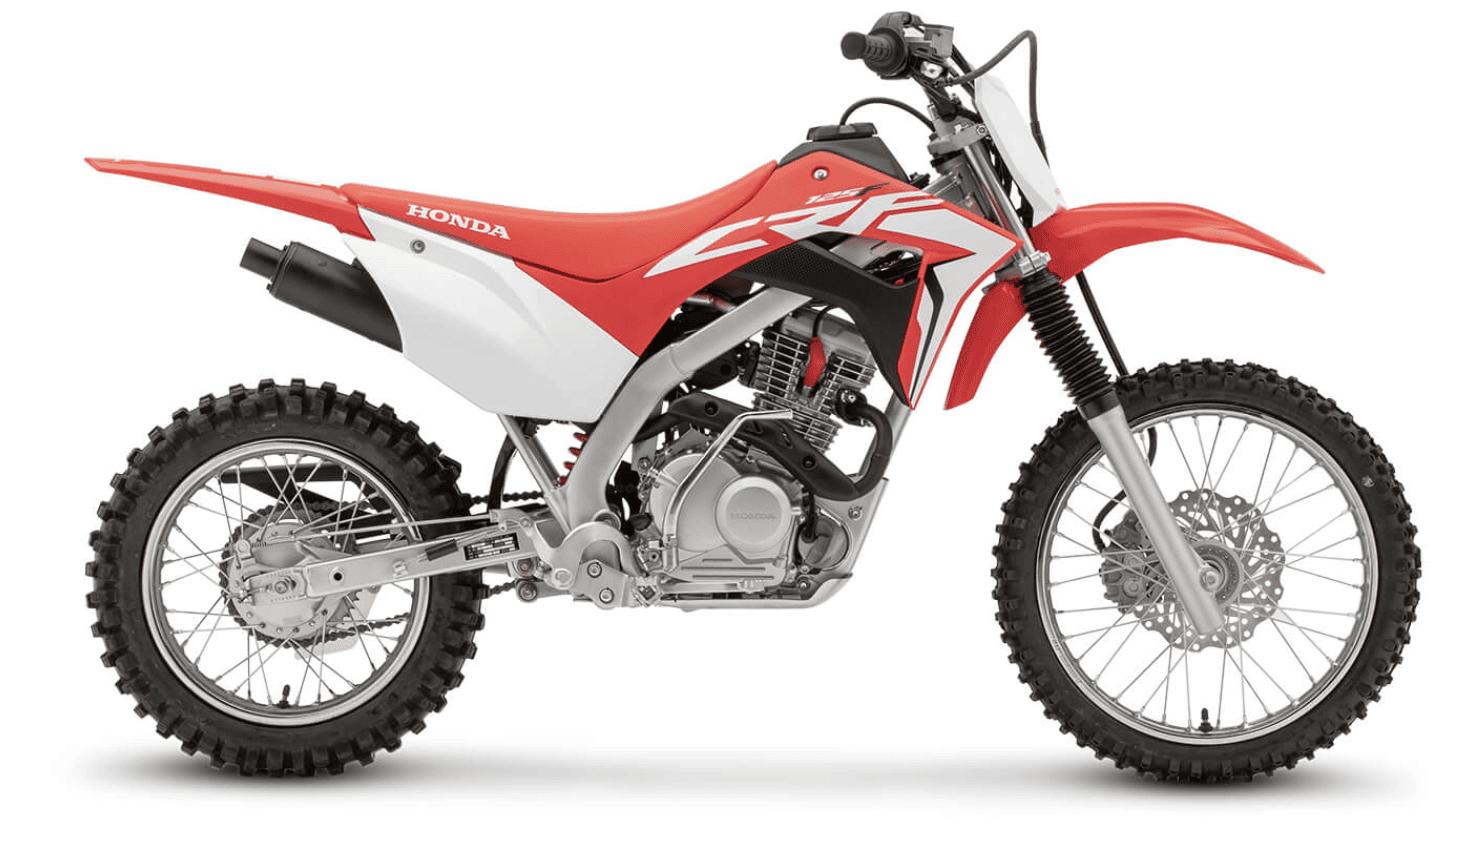 Standard CRF125F dirt bike for ladies